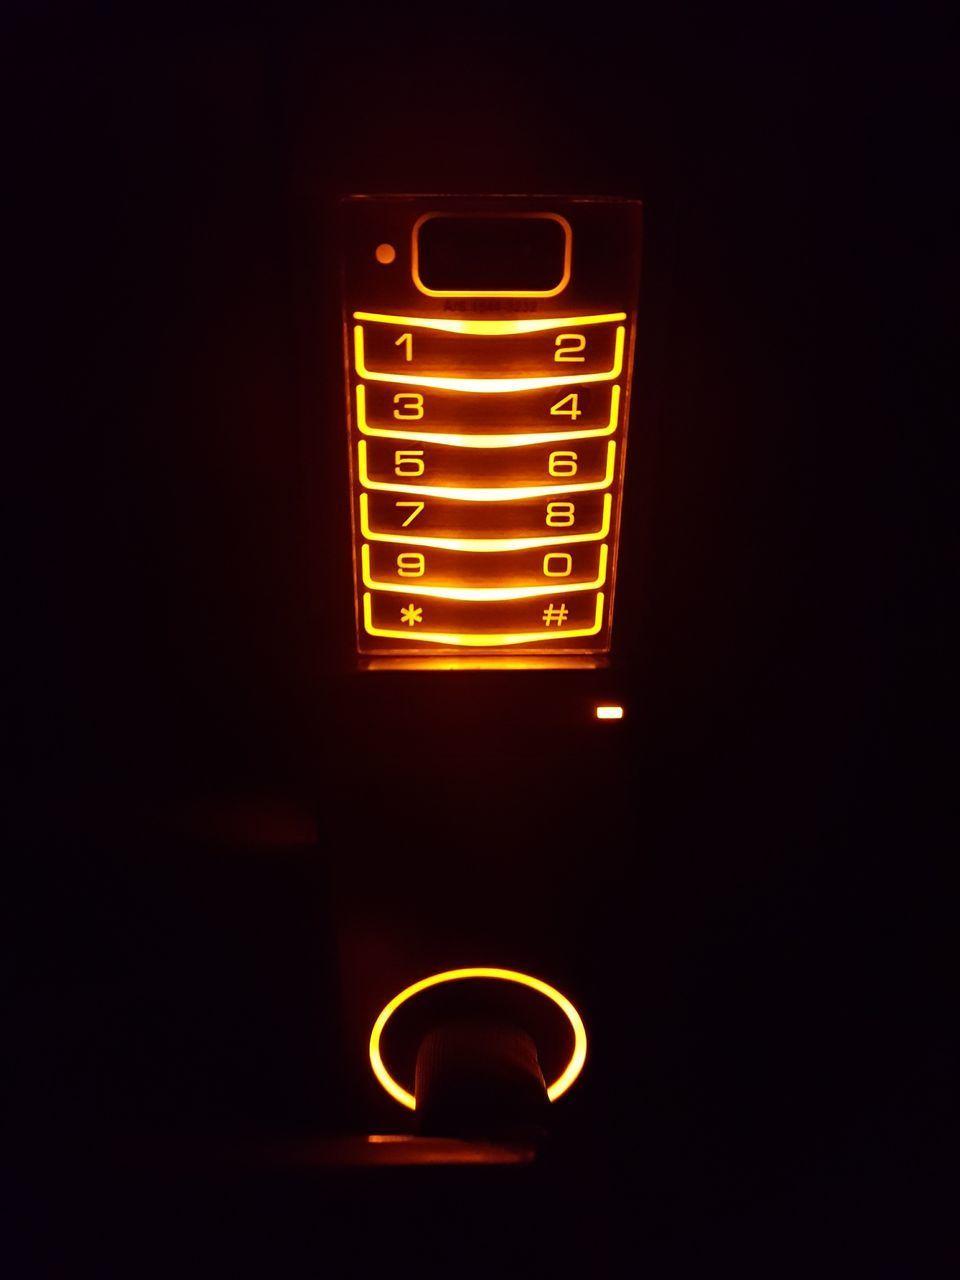 CLOSE-UP OF ILLUMINATED ELECTRIC LIGHT BULB